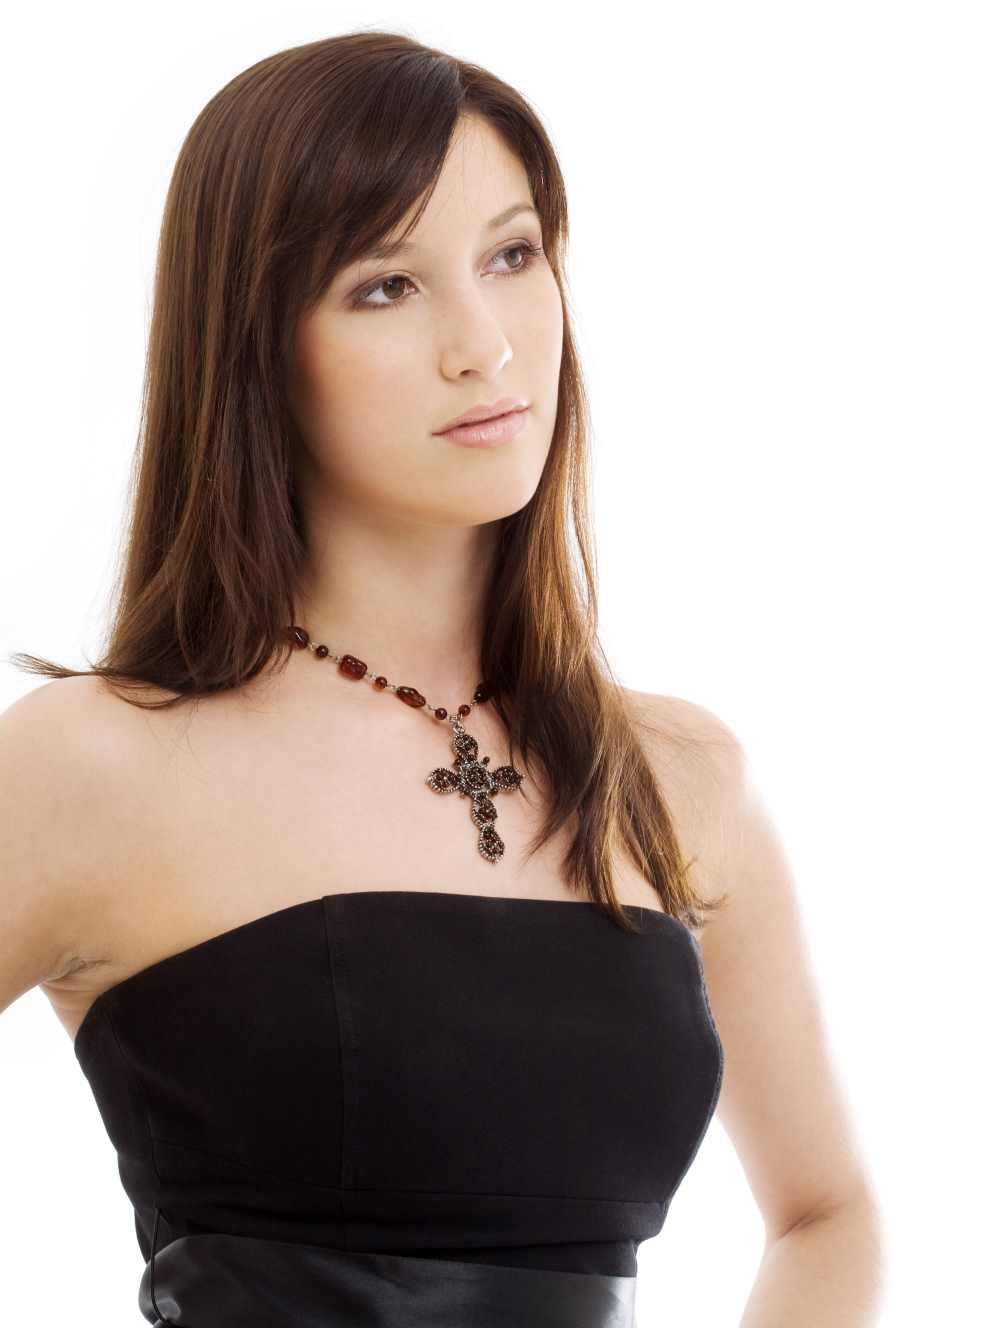 Christian jewellery